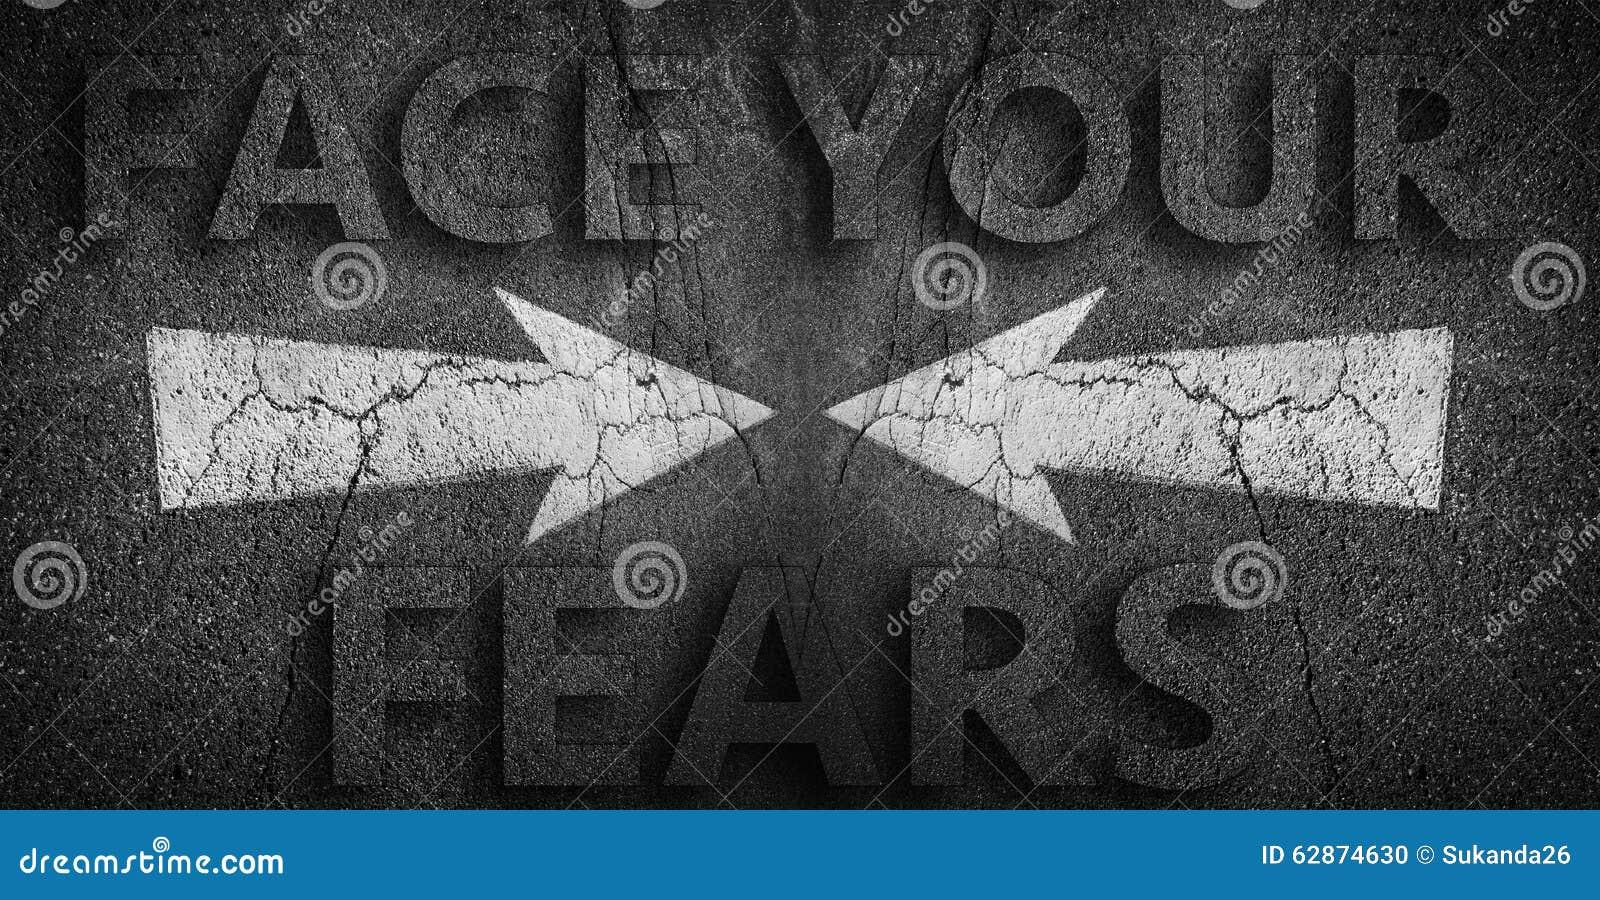 Face you fears written on road